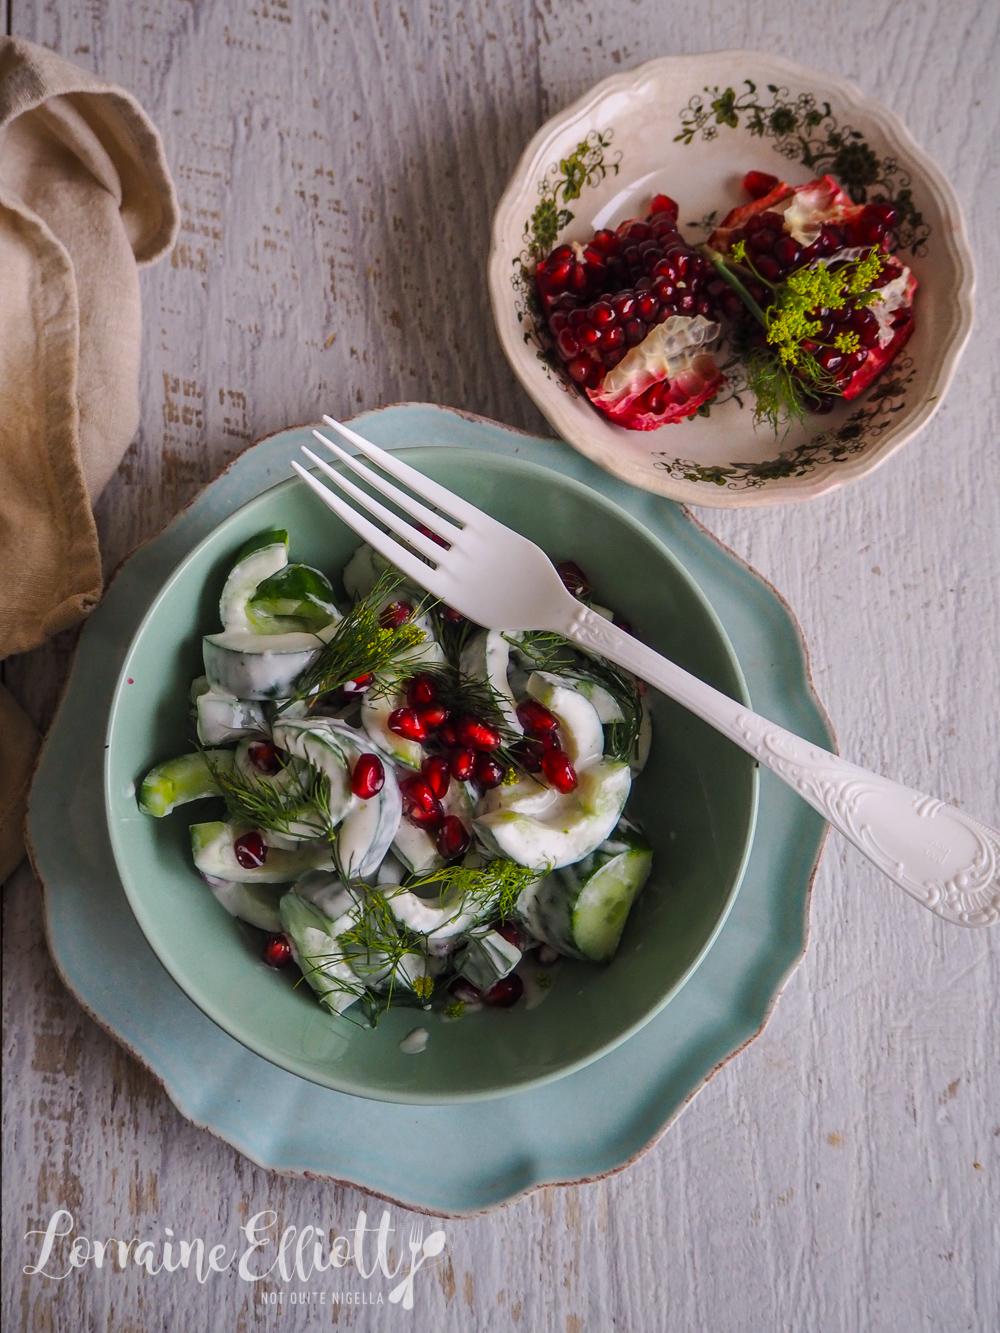 Cucumber & Pomegranate 5 Minute Salad